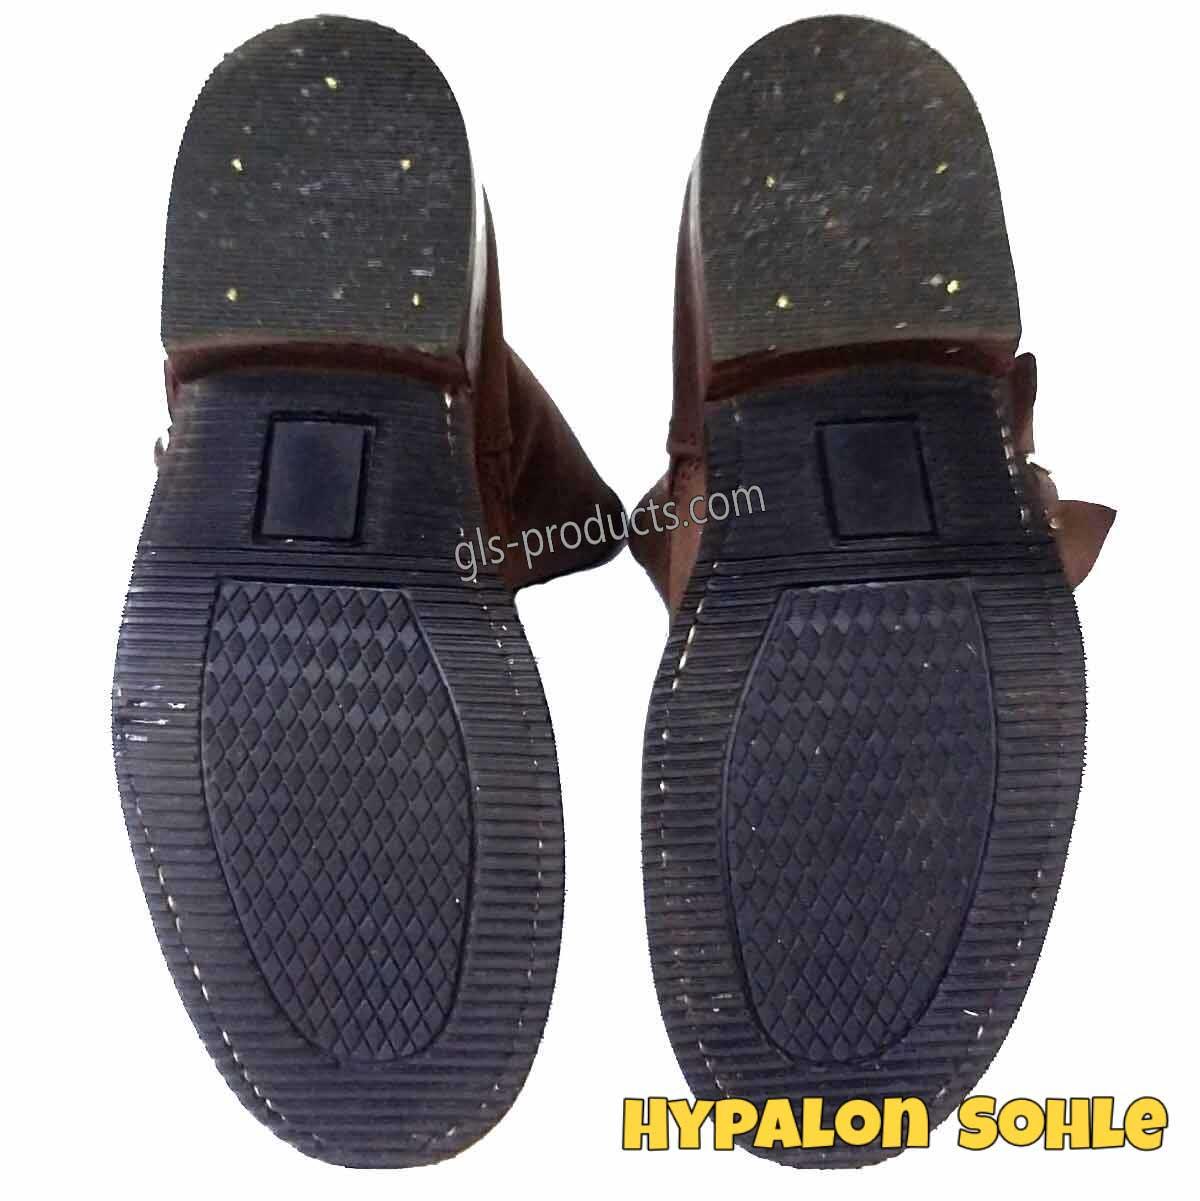 premium selection 1b313 4cc66 Buffalo Engineer Boots with Steeltoe